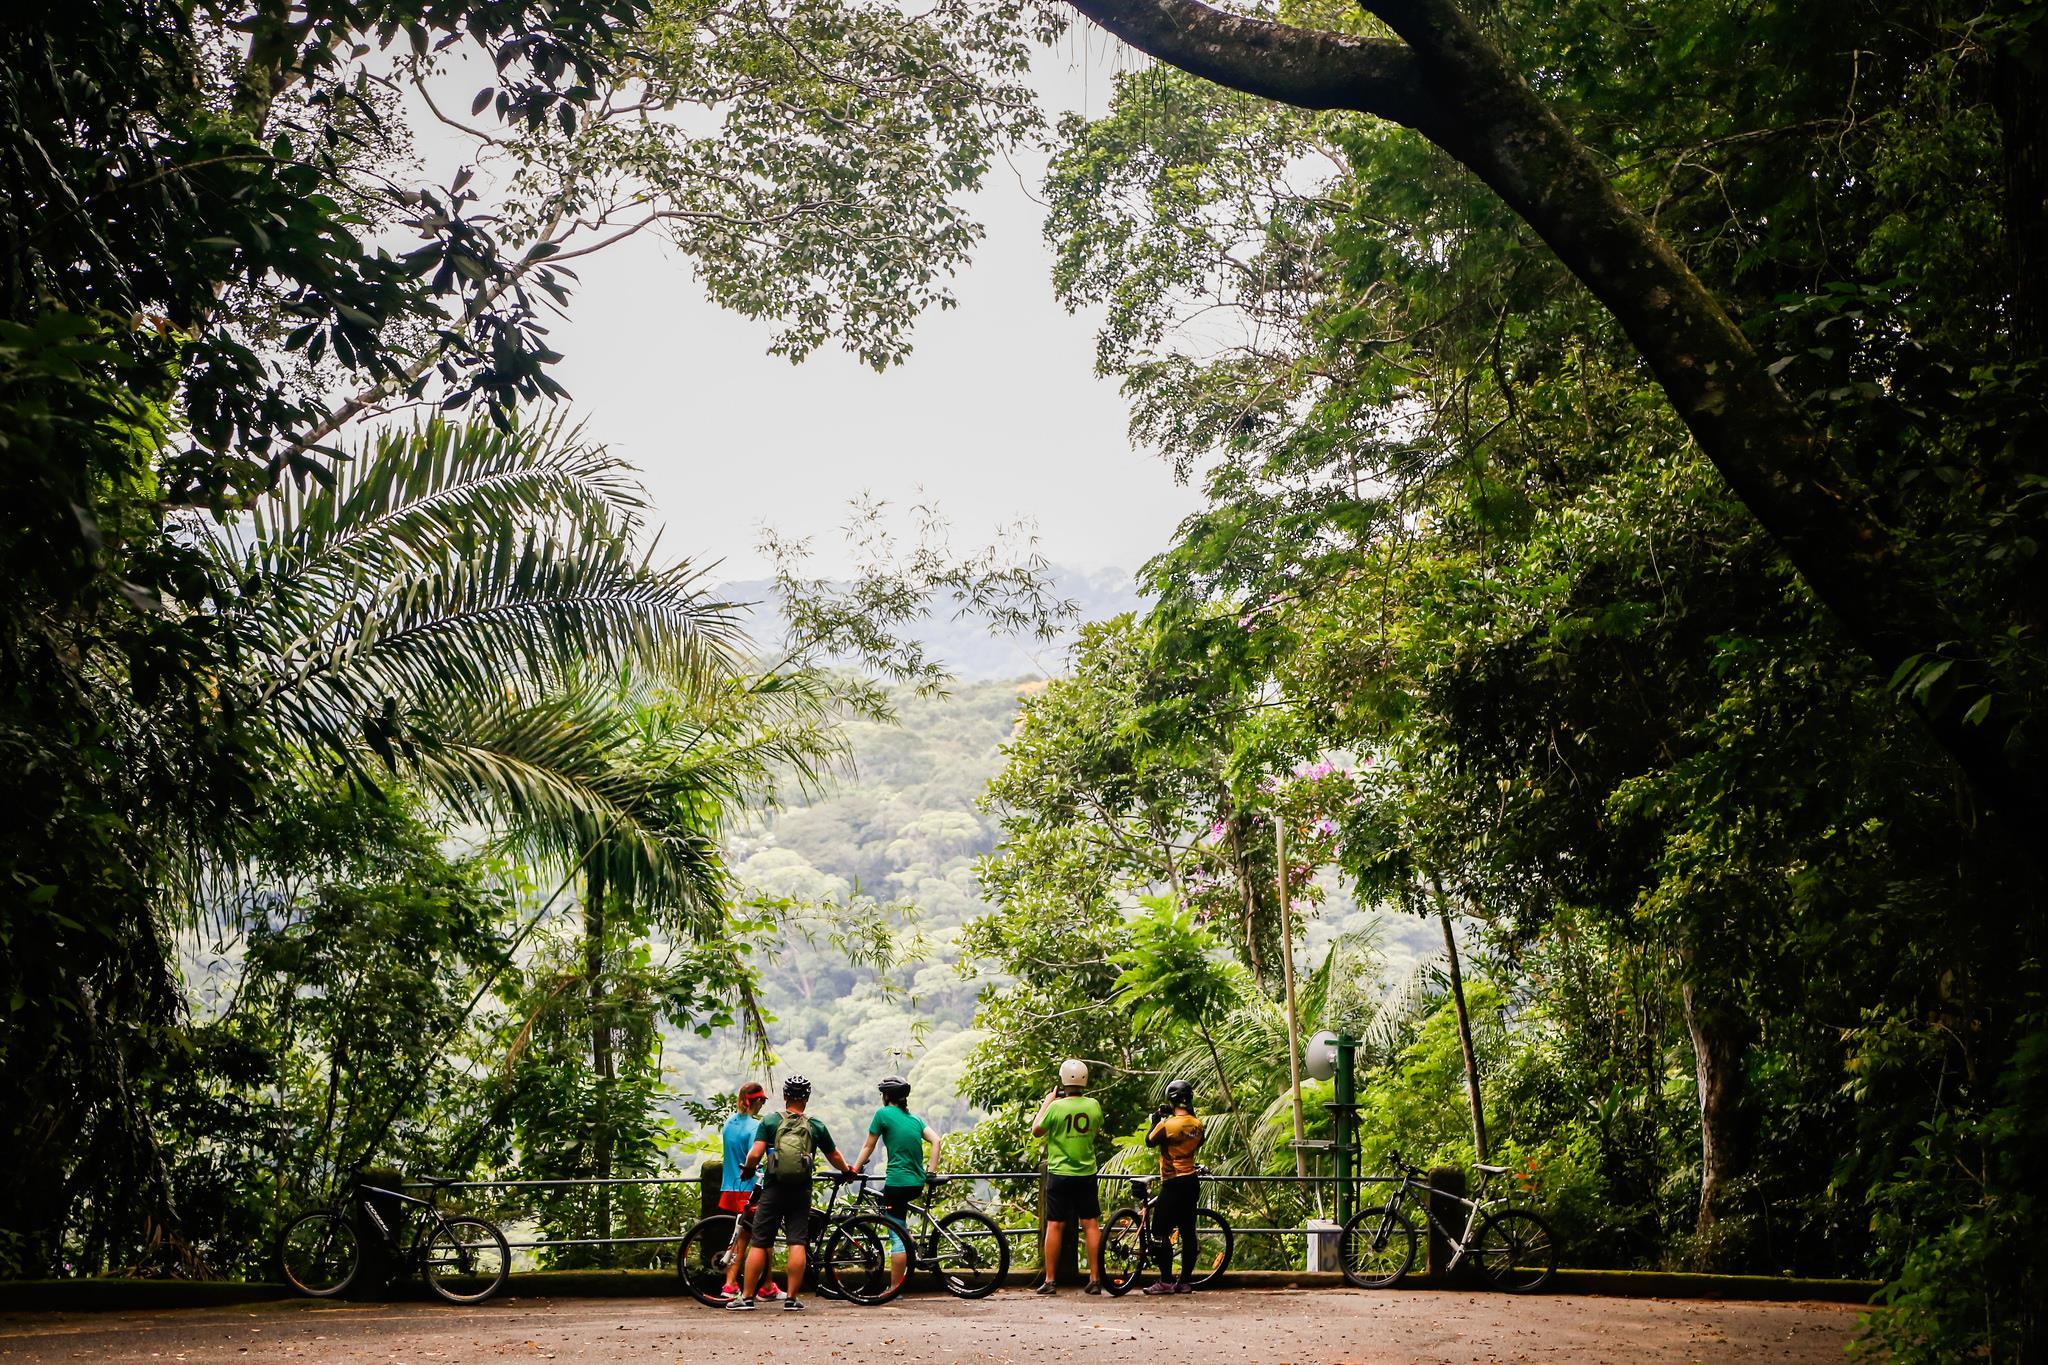 Rio-jungle-bike-tour.jpg